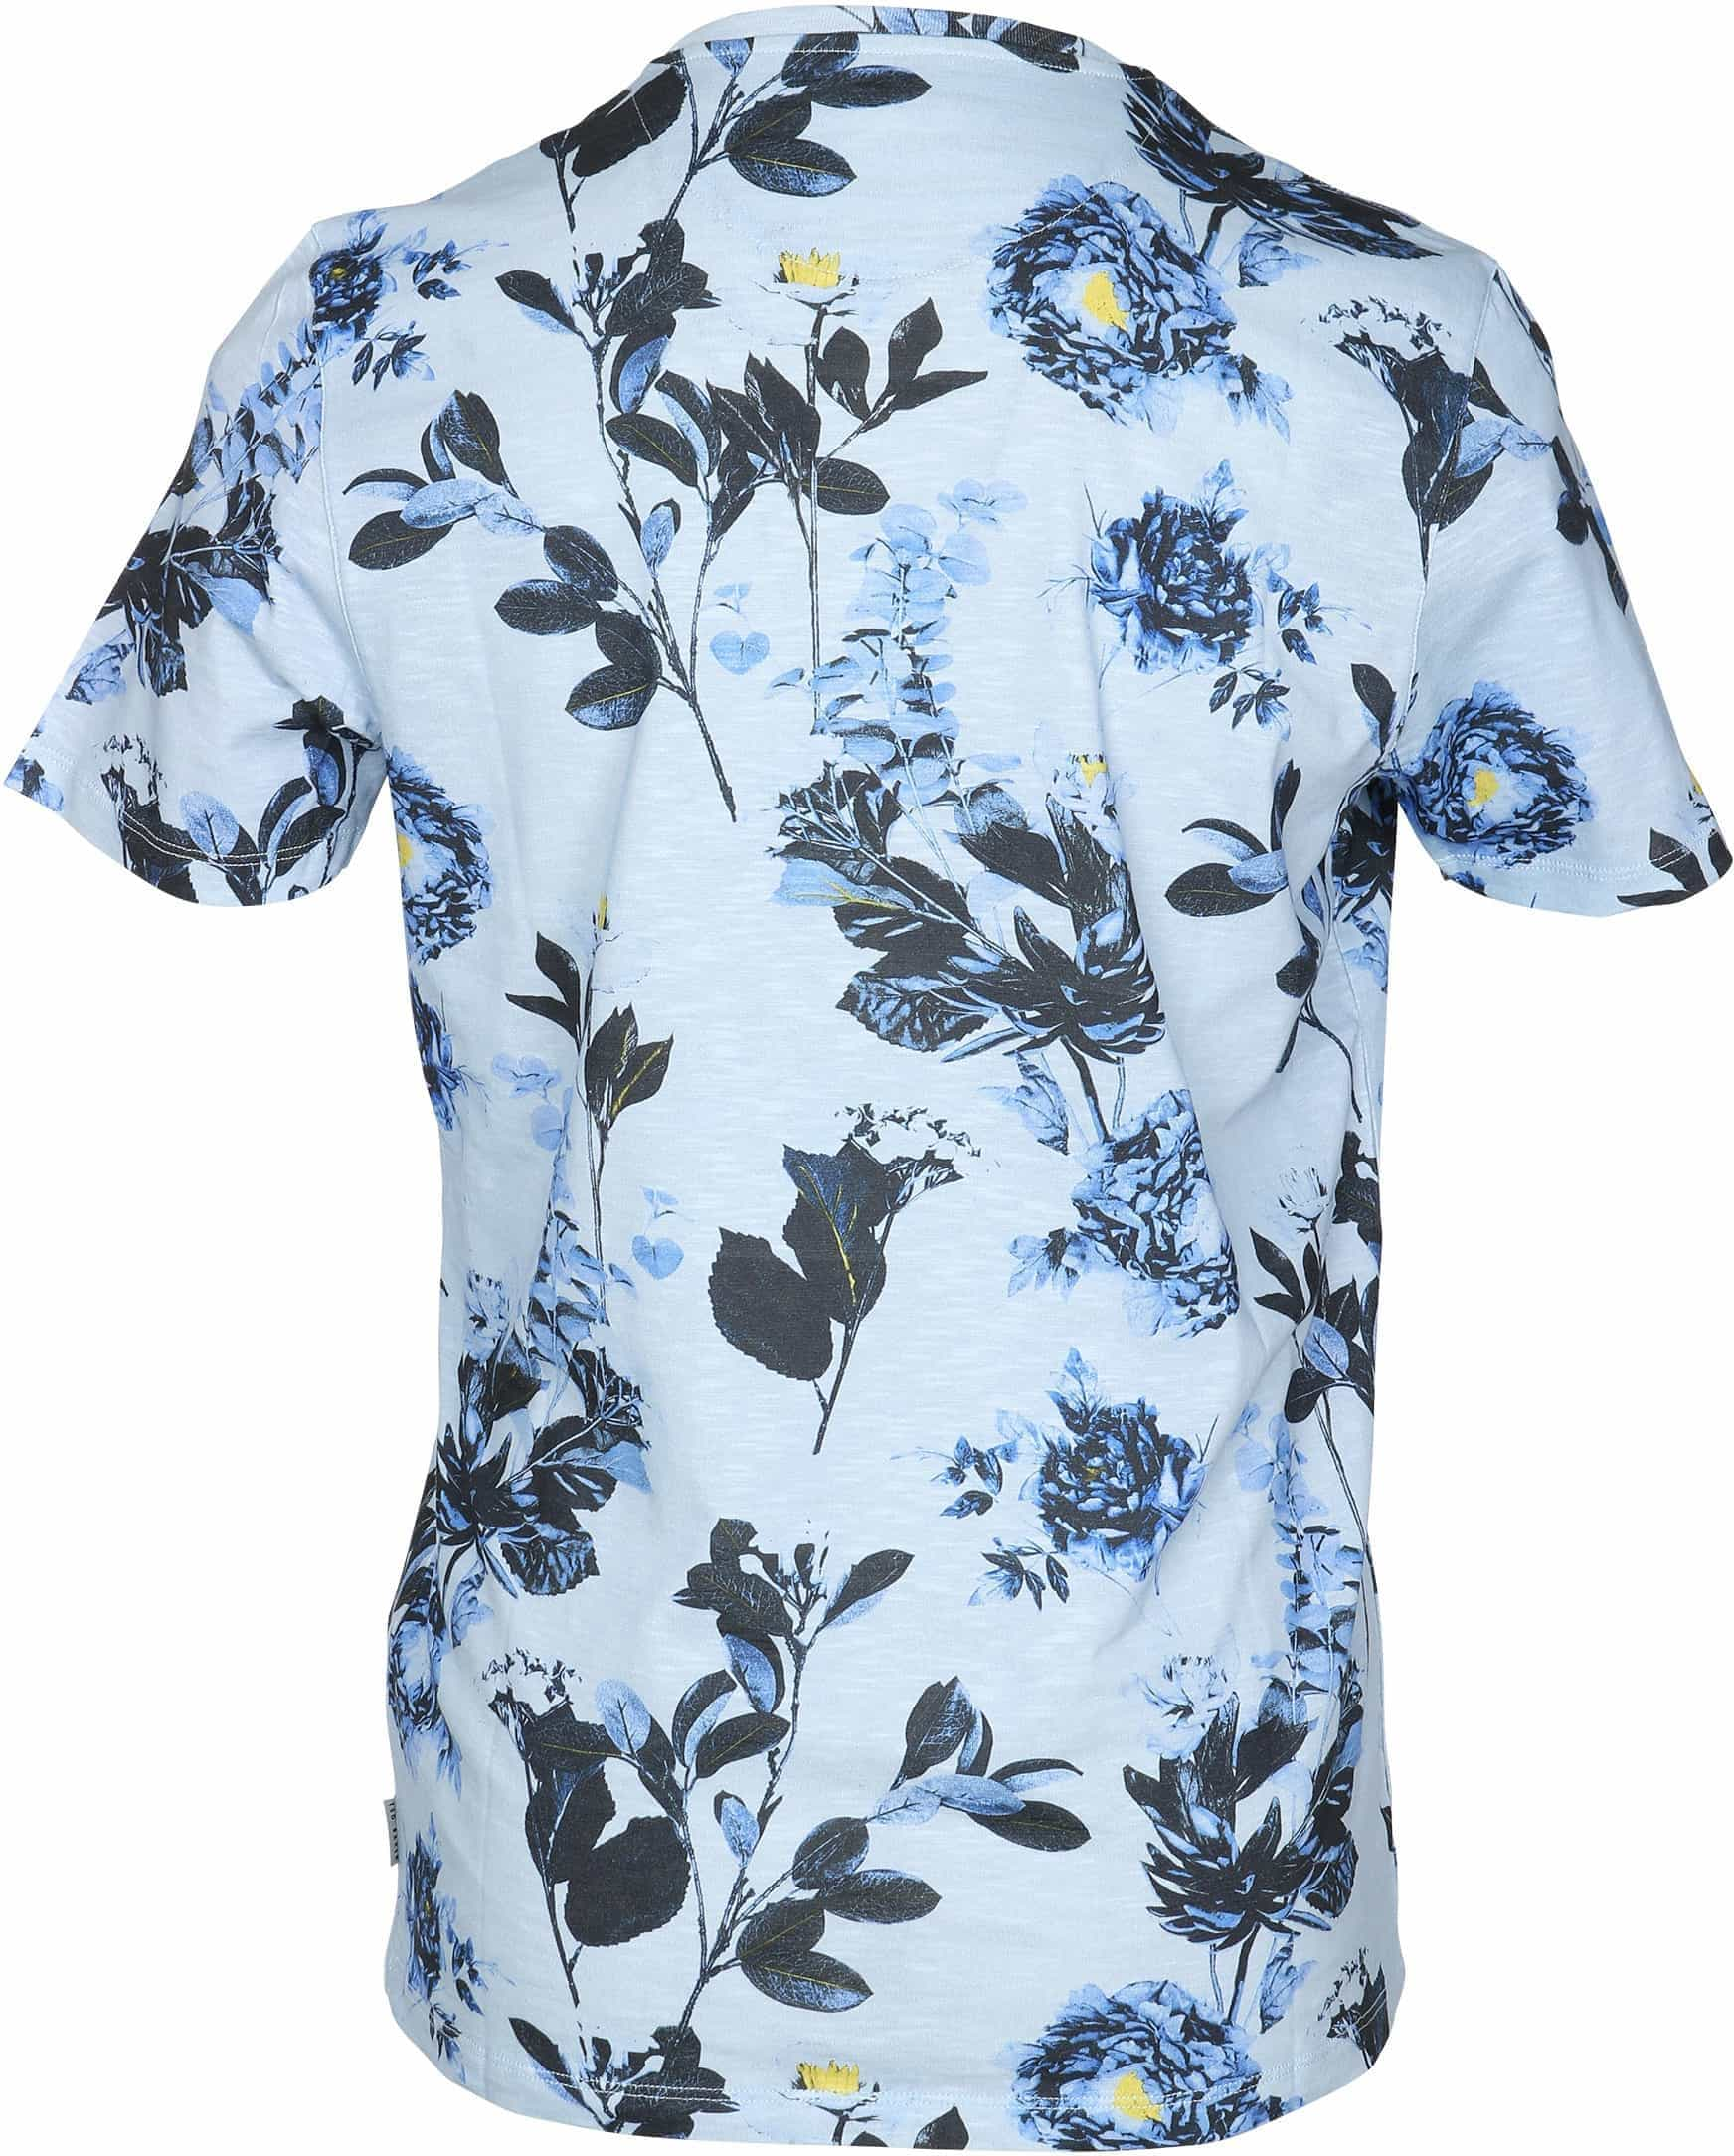 Ted Baker T-Shirt Blau foto 3